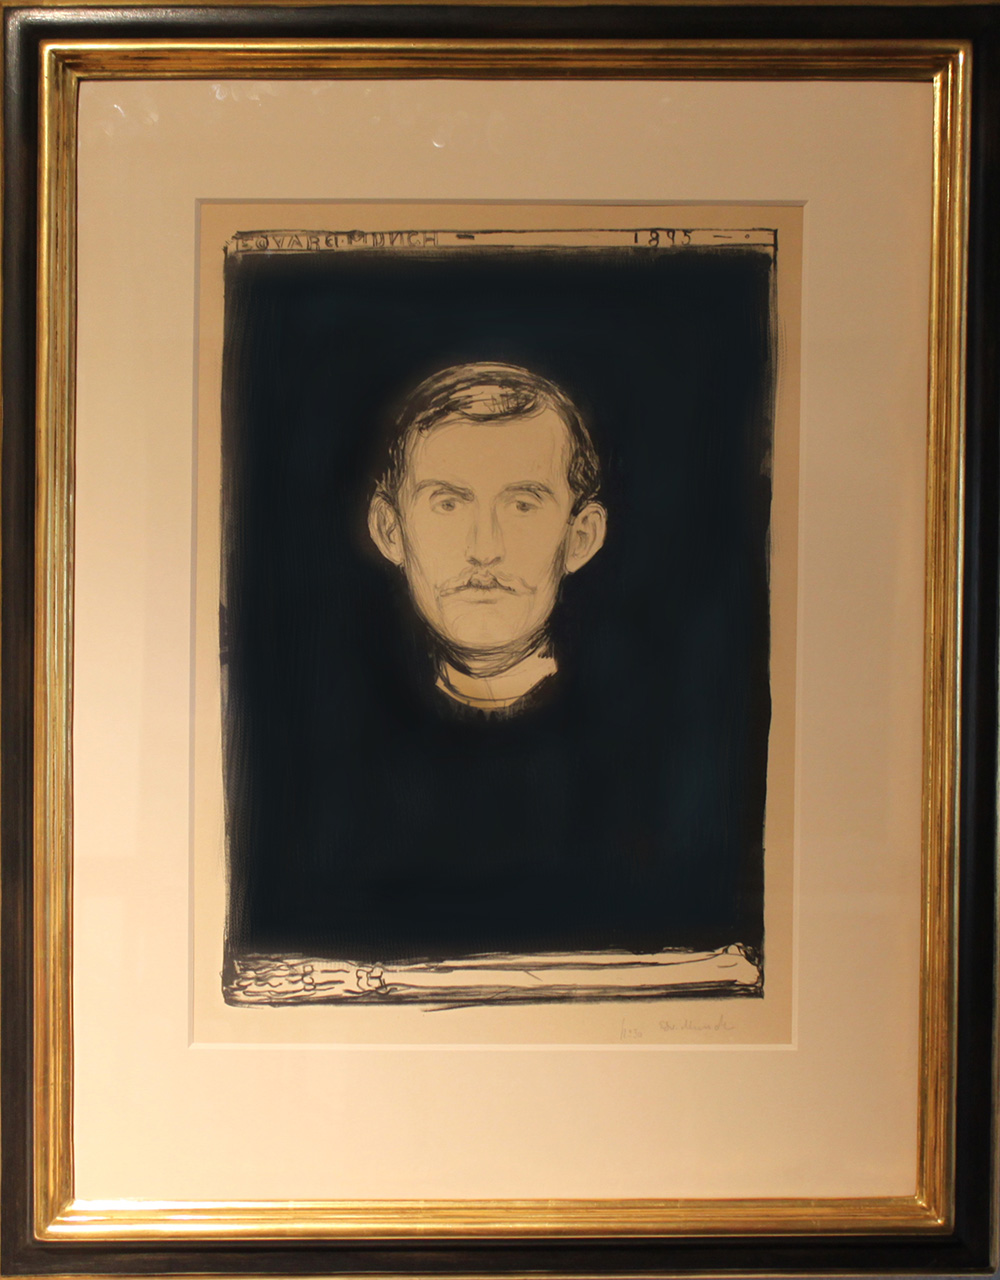 Edvard Much Selvportrett. 1895. Woll 37n